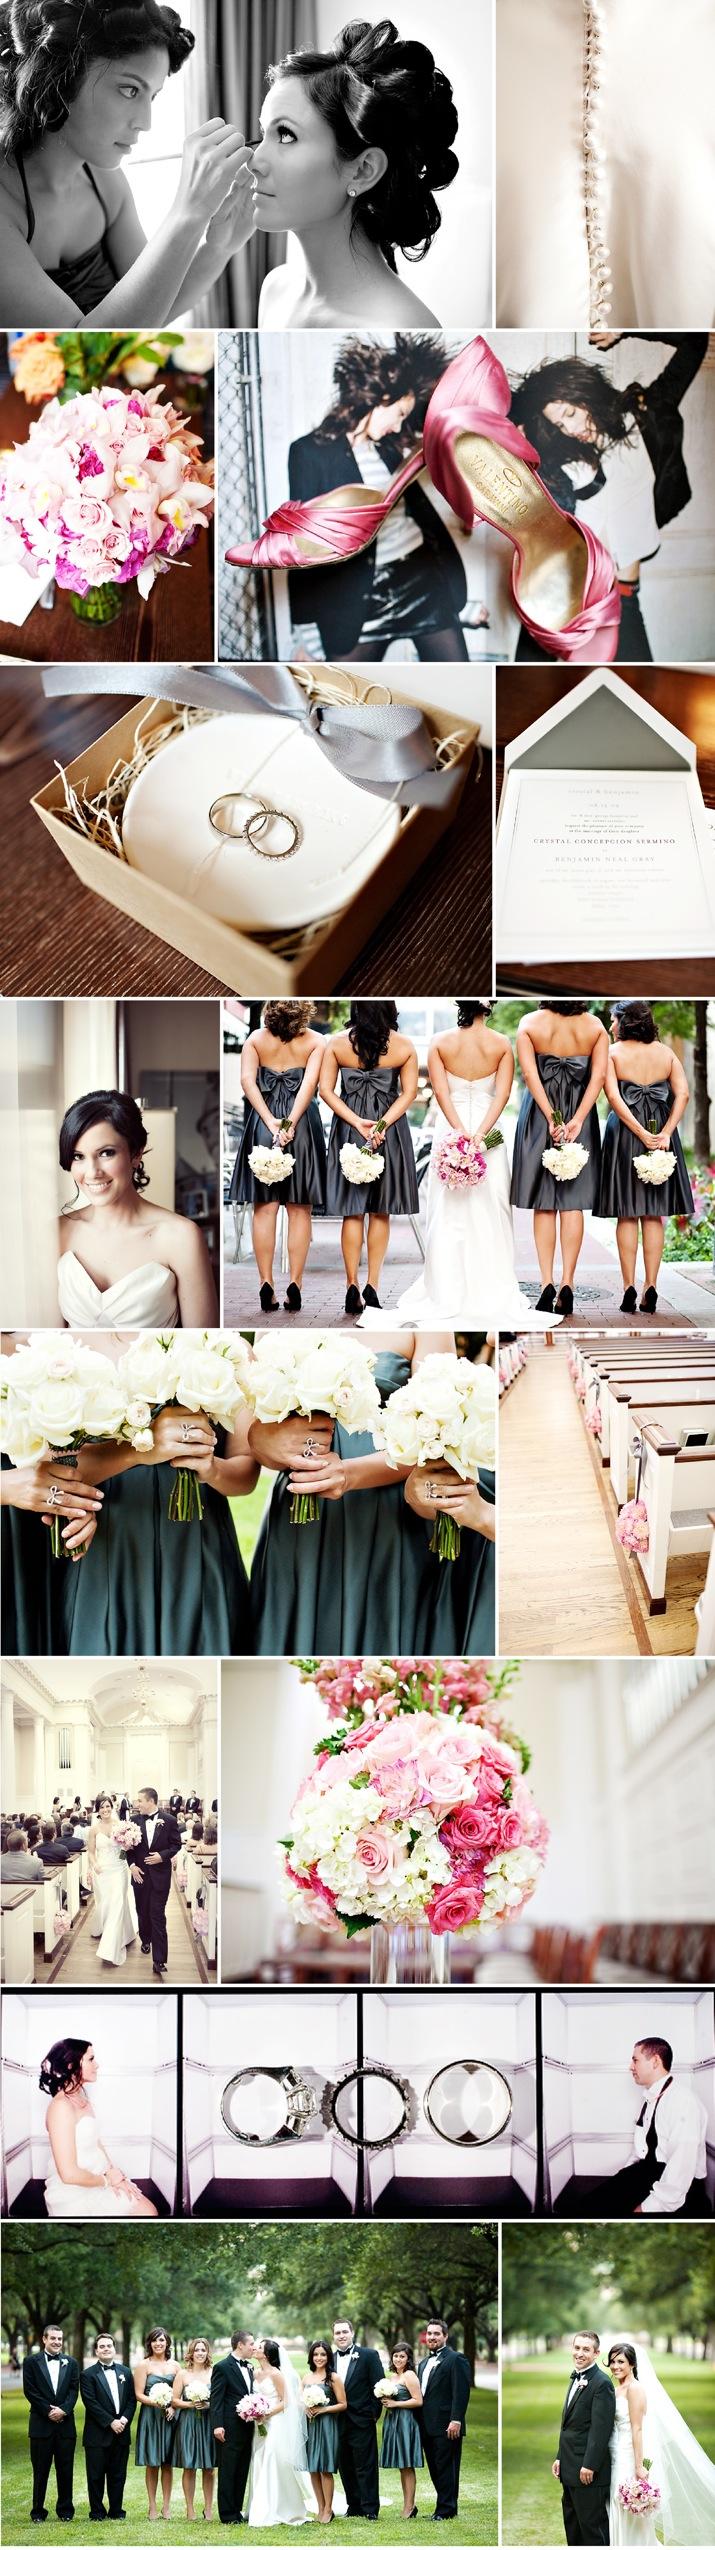 SWS Mag Shopping & Travel Blog Southern weddings